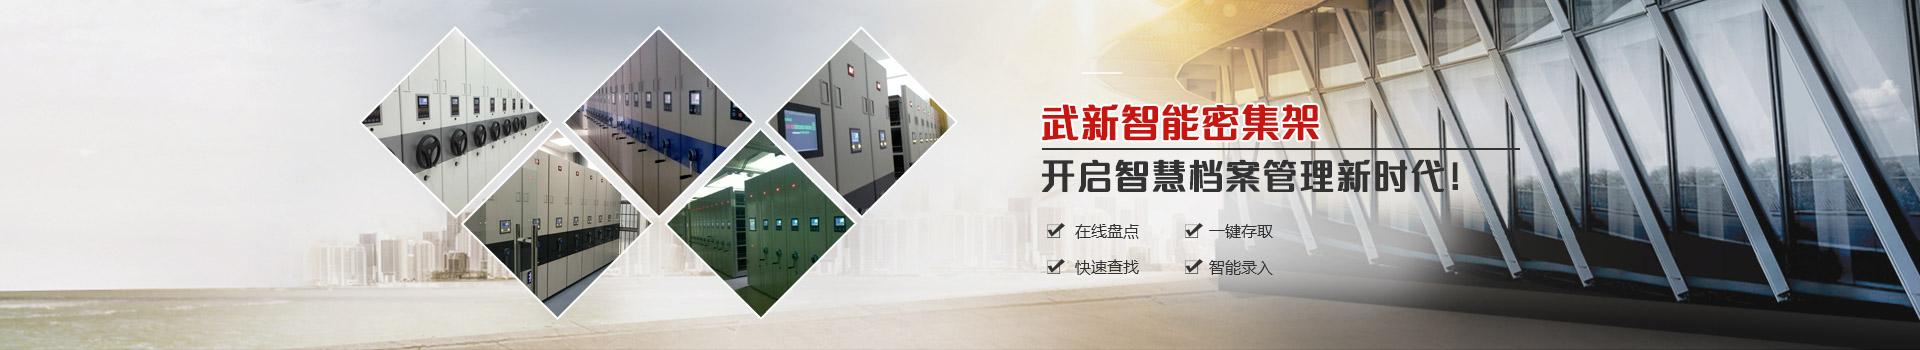 wuxin智能密集架    开qi智慧档案管理xin时代!